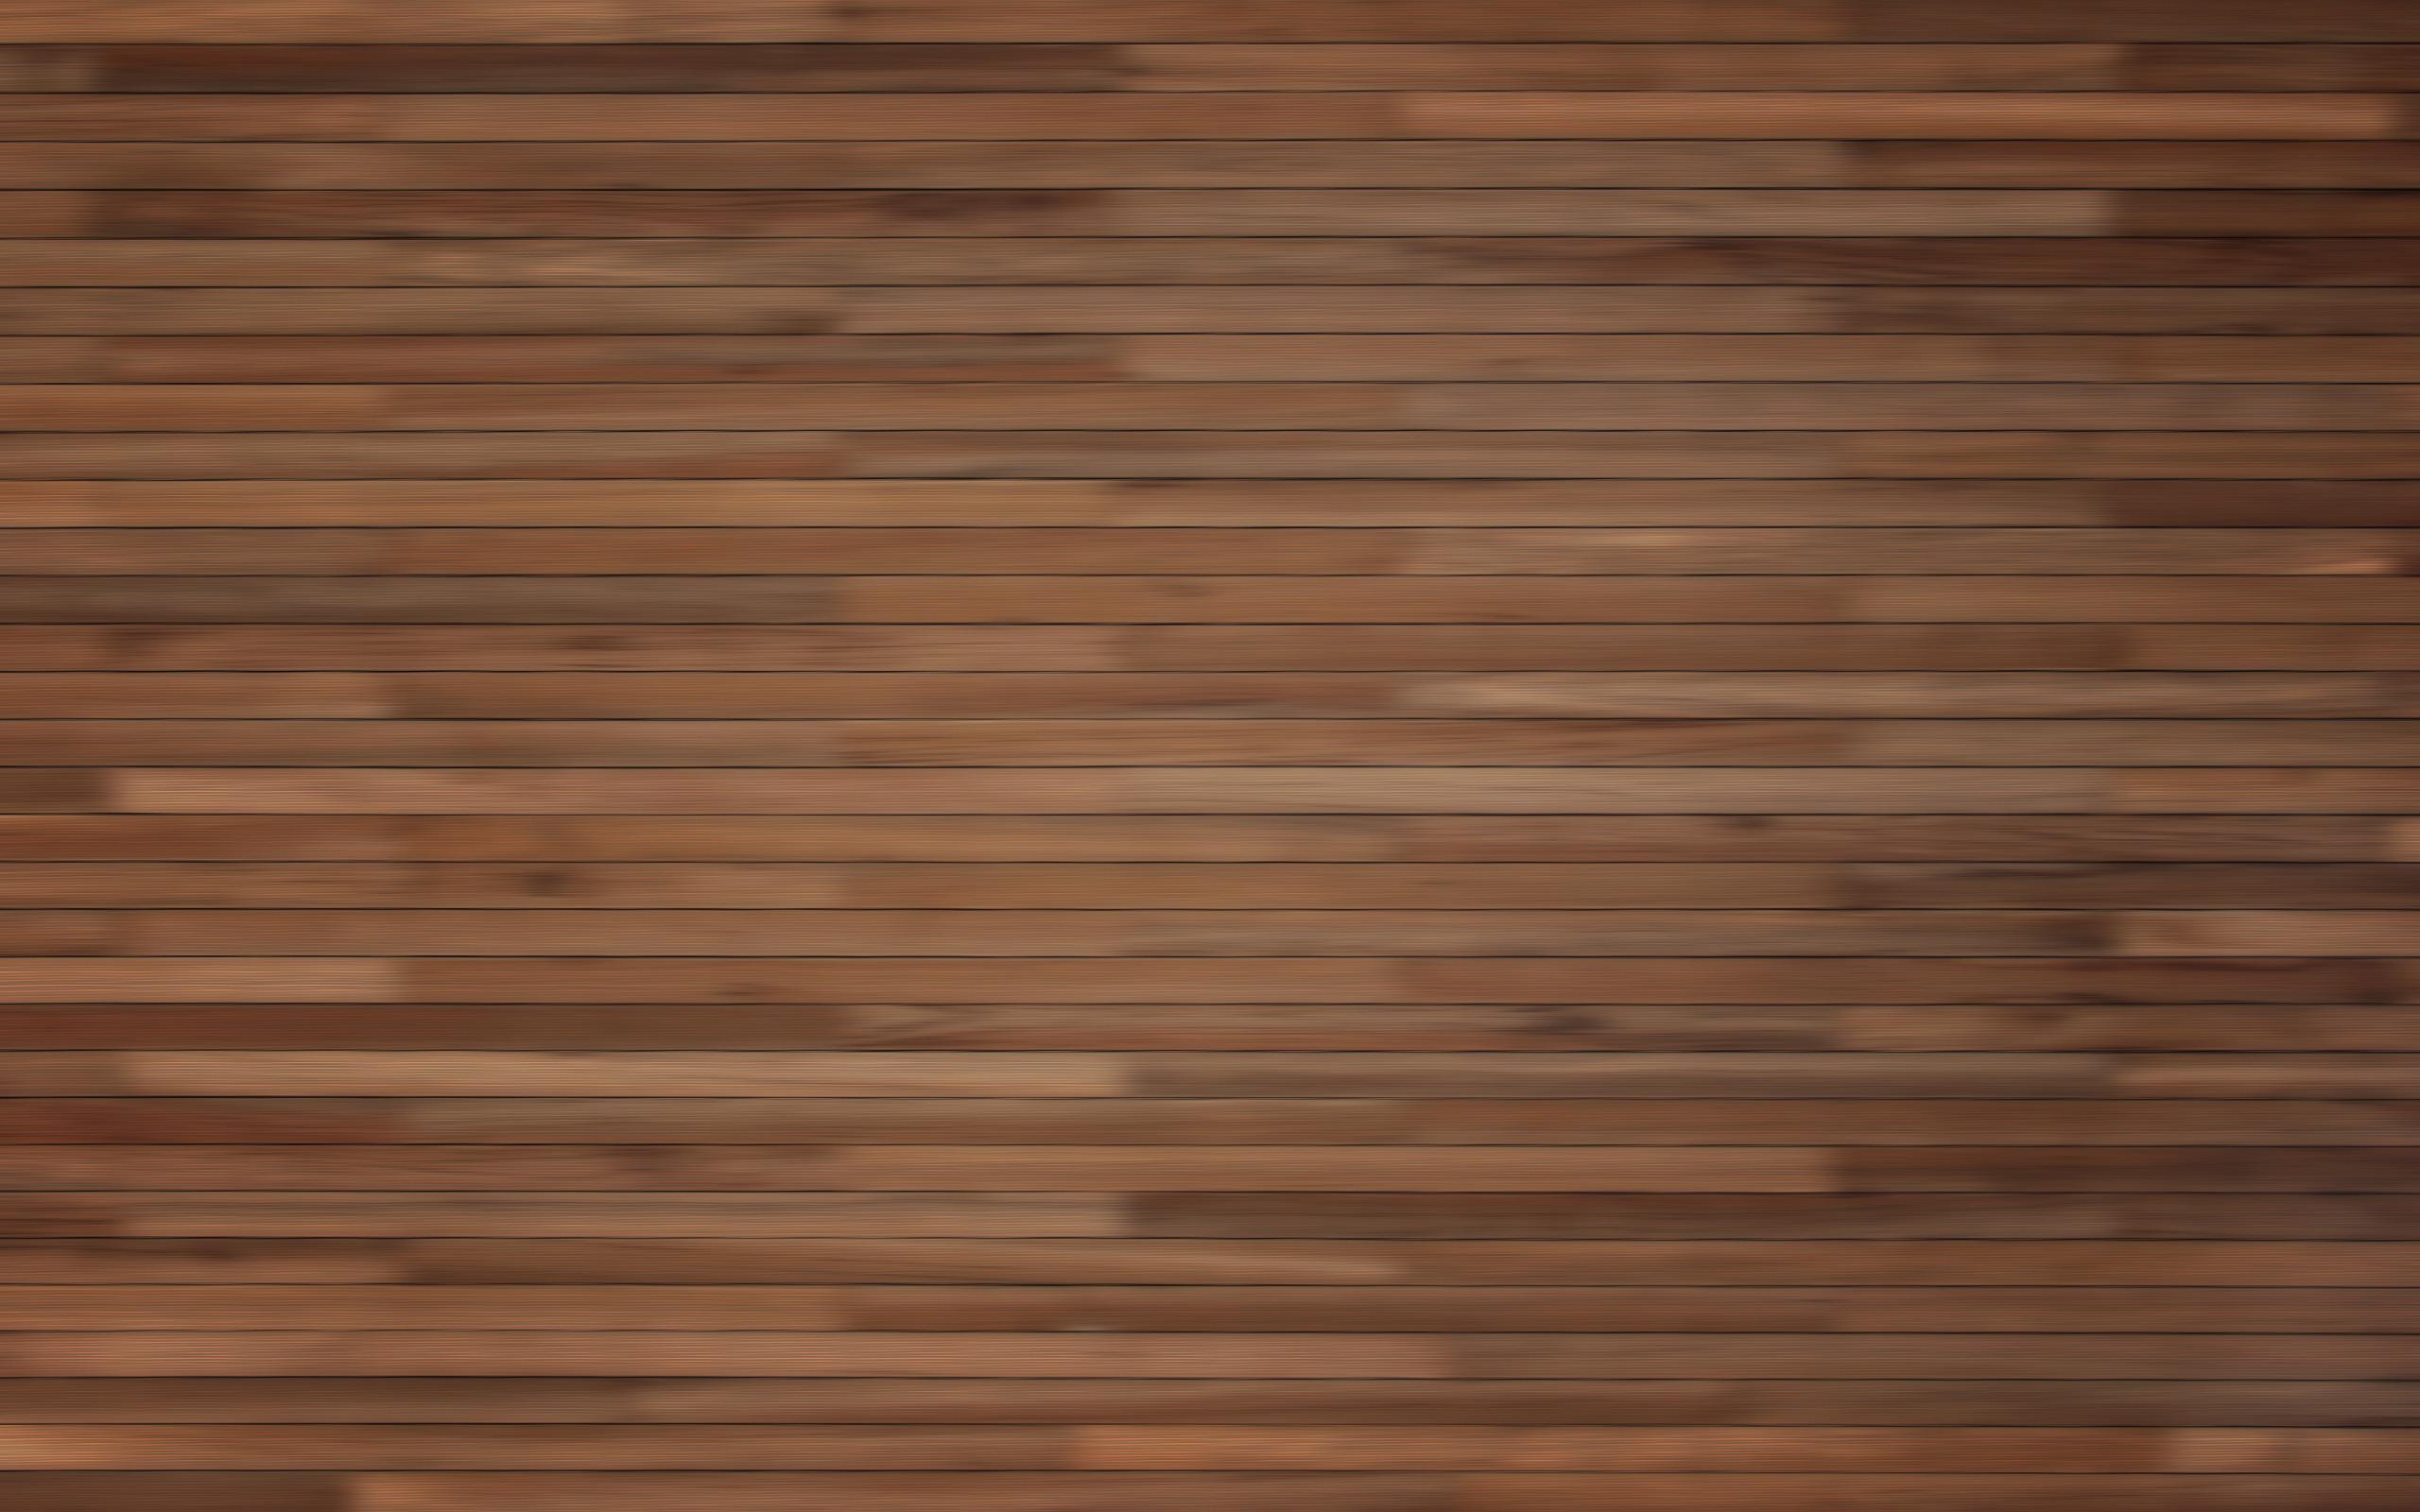 wallpaper texture flooring boards wood textures woodjpg 2560x1600